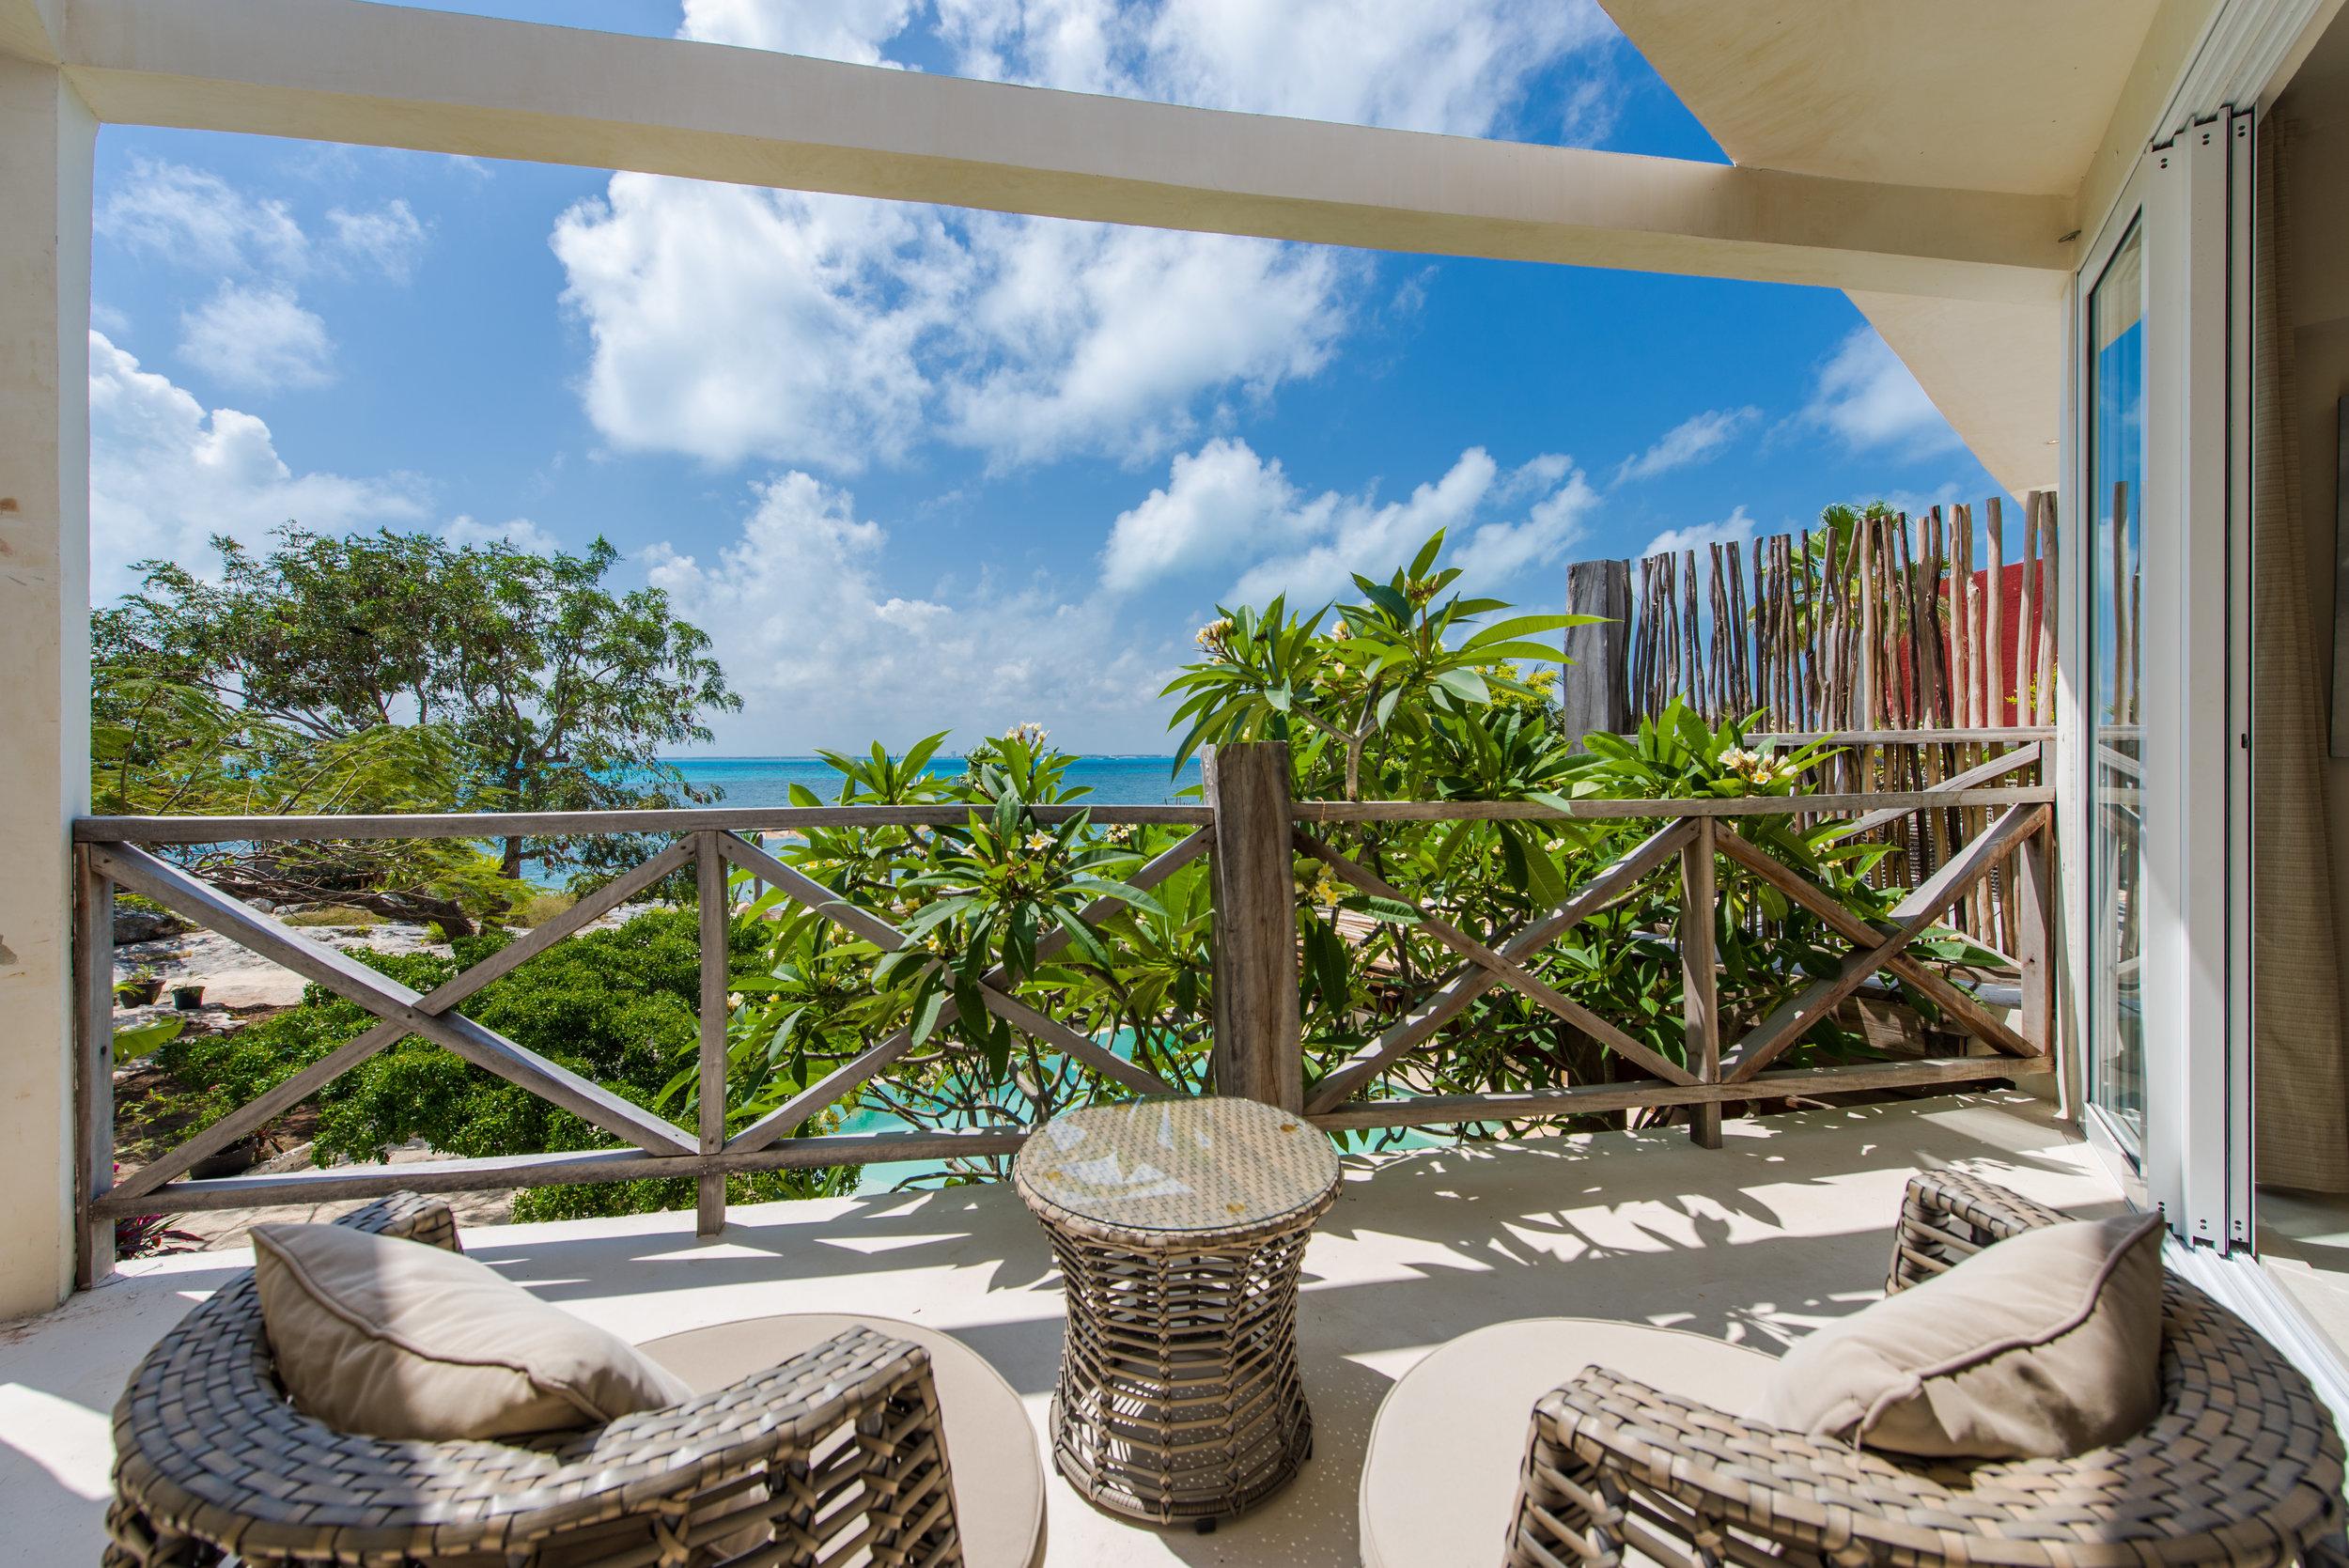 Casa Coco Isla Mujeres-7235.jpg